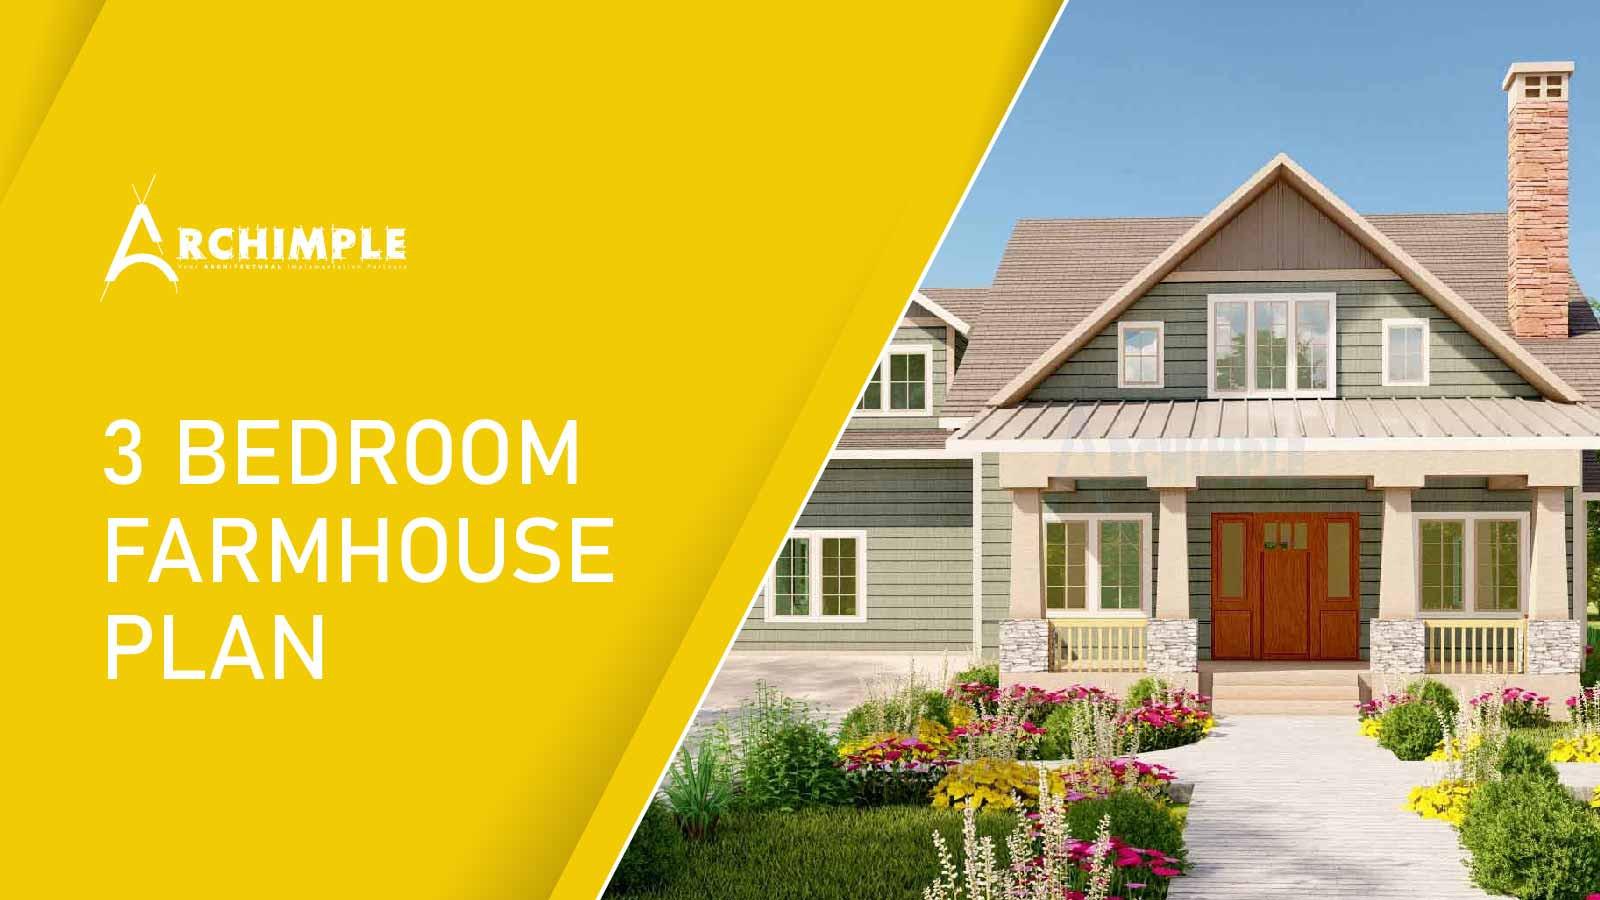 3 Bedroom Farmhouse Plans